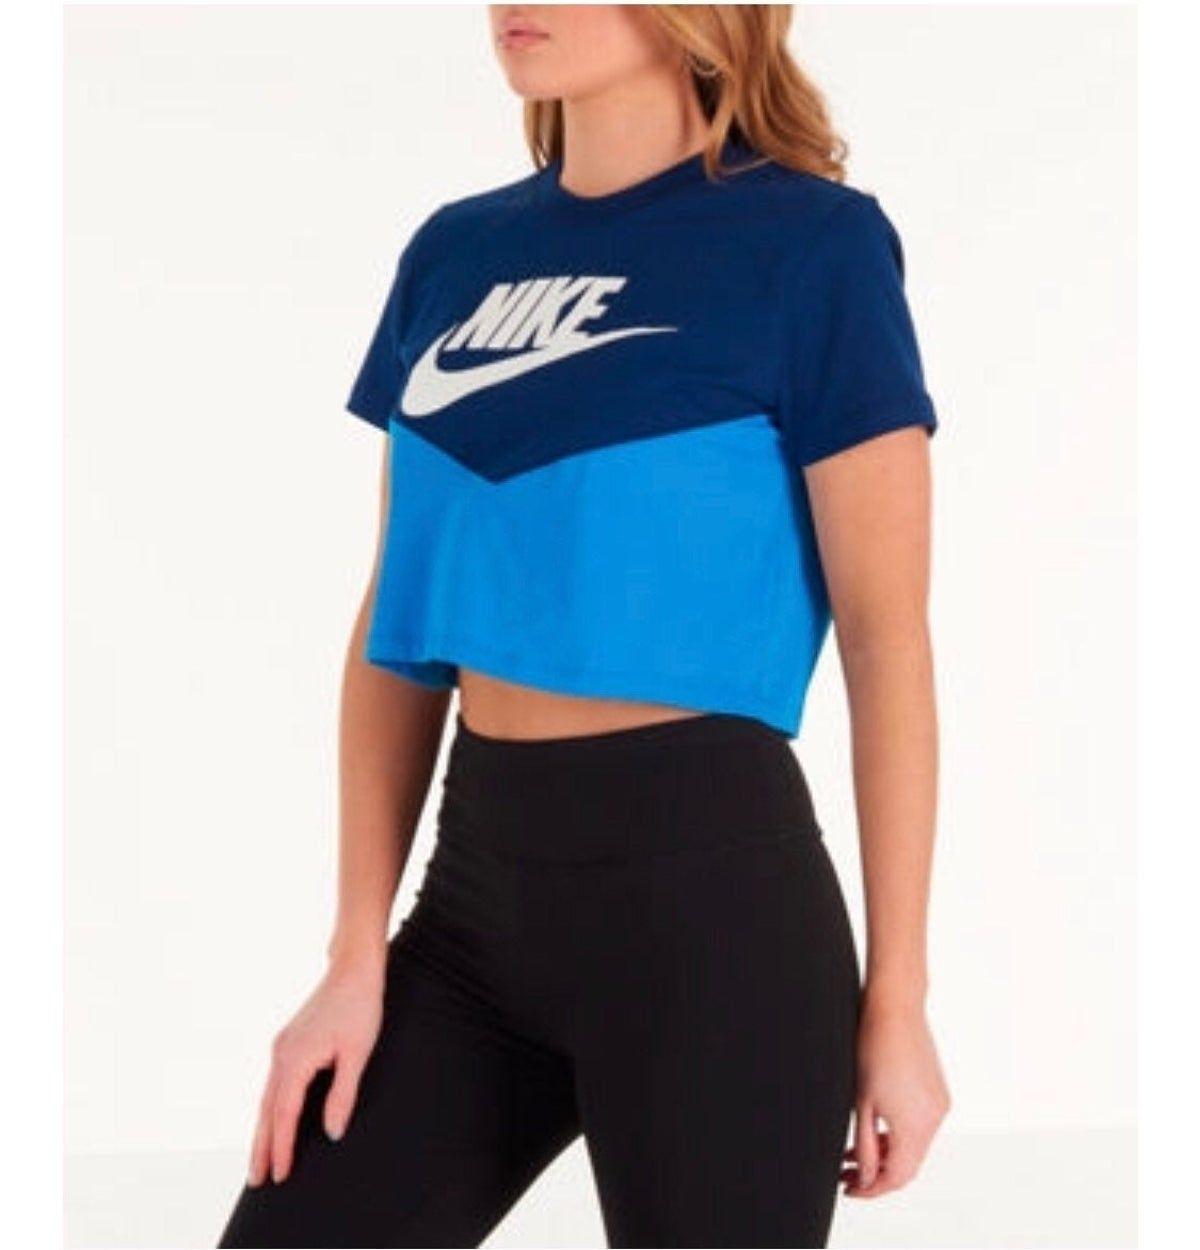 Nike Crop Top Nike Crop Top Nike Women Crop Tops For Kids [ 1250 x 1200 Pixel ]